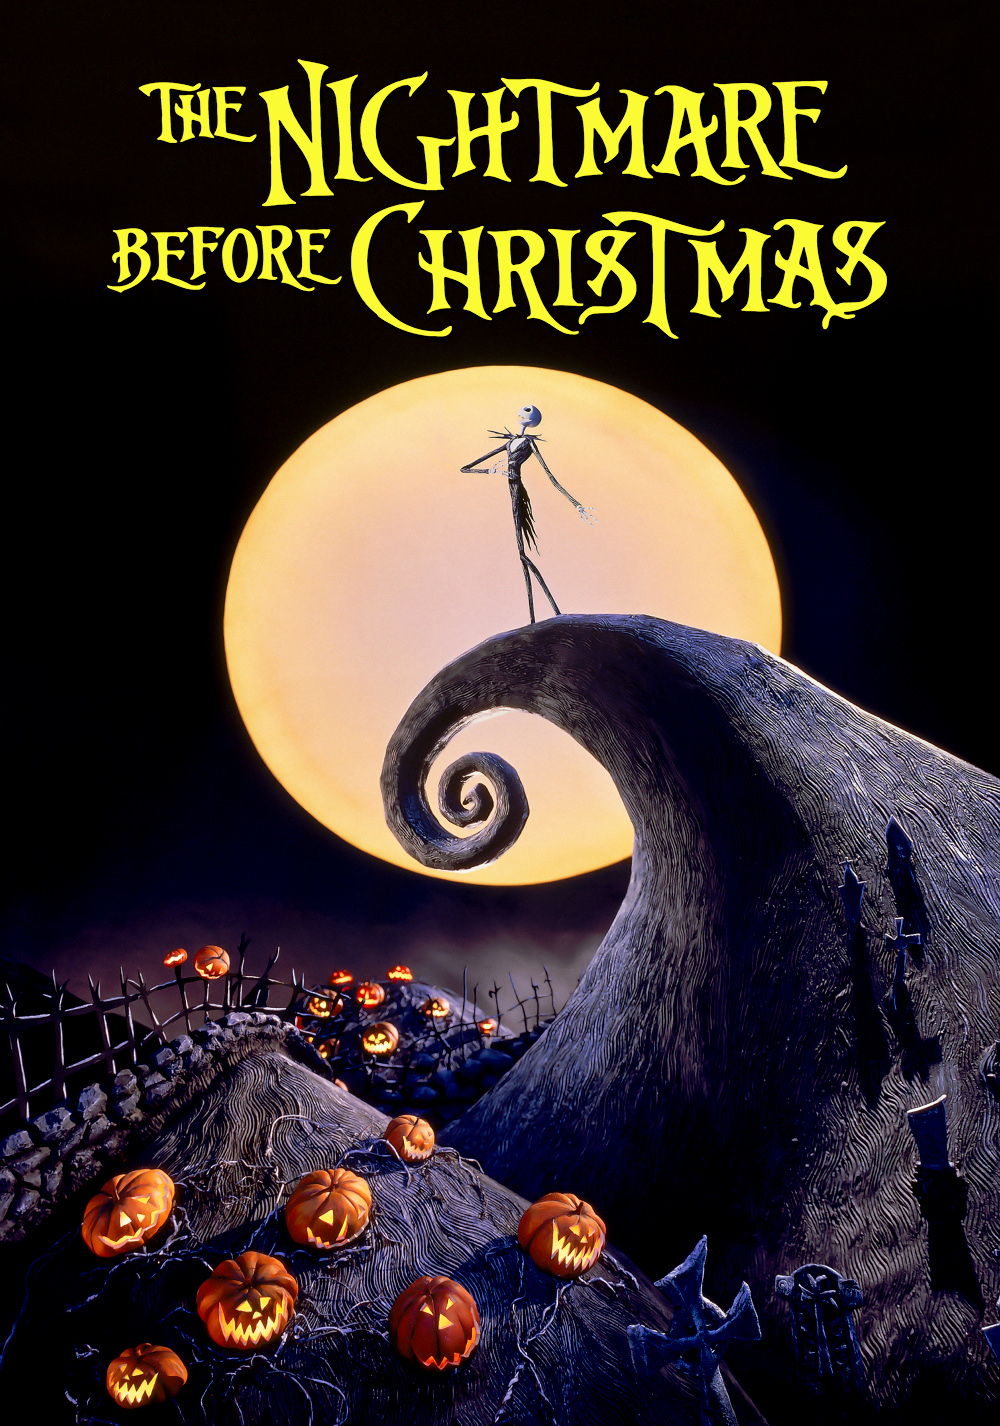 The Nightmare Before Christmas 1993   Official Home pubfilm.com